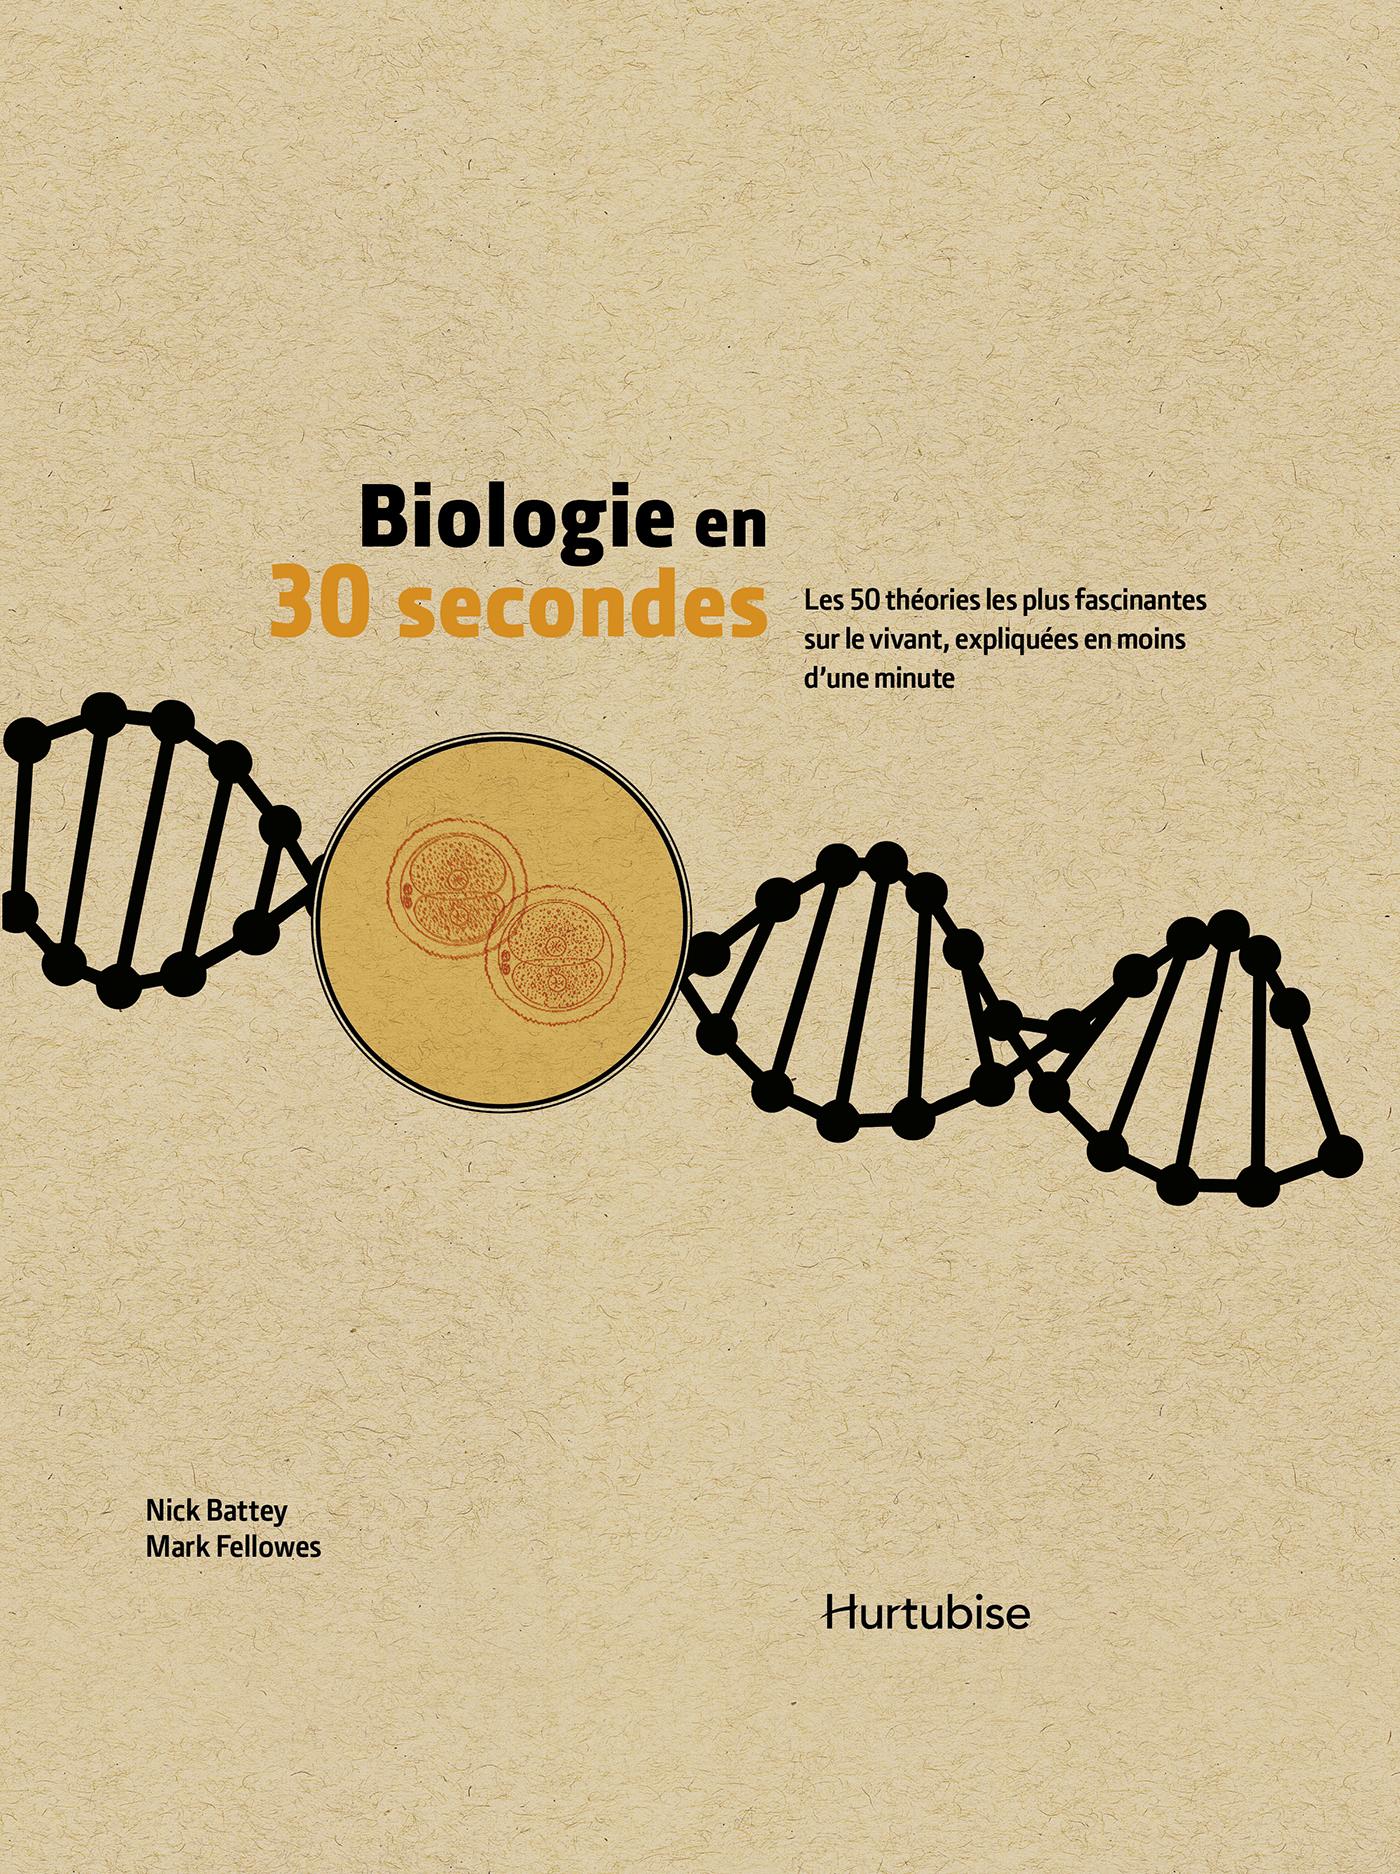 Biologie en 30 secondes